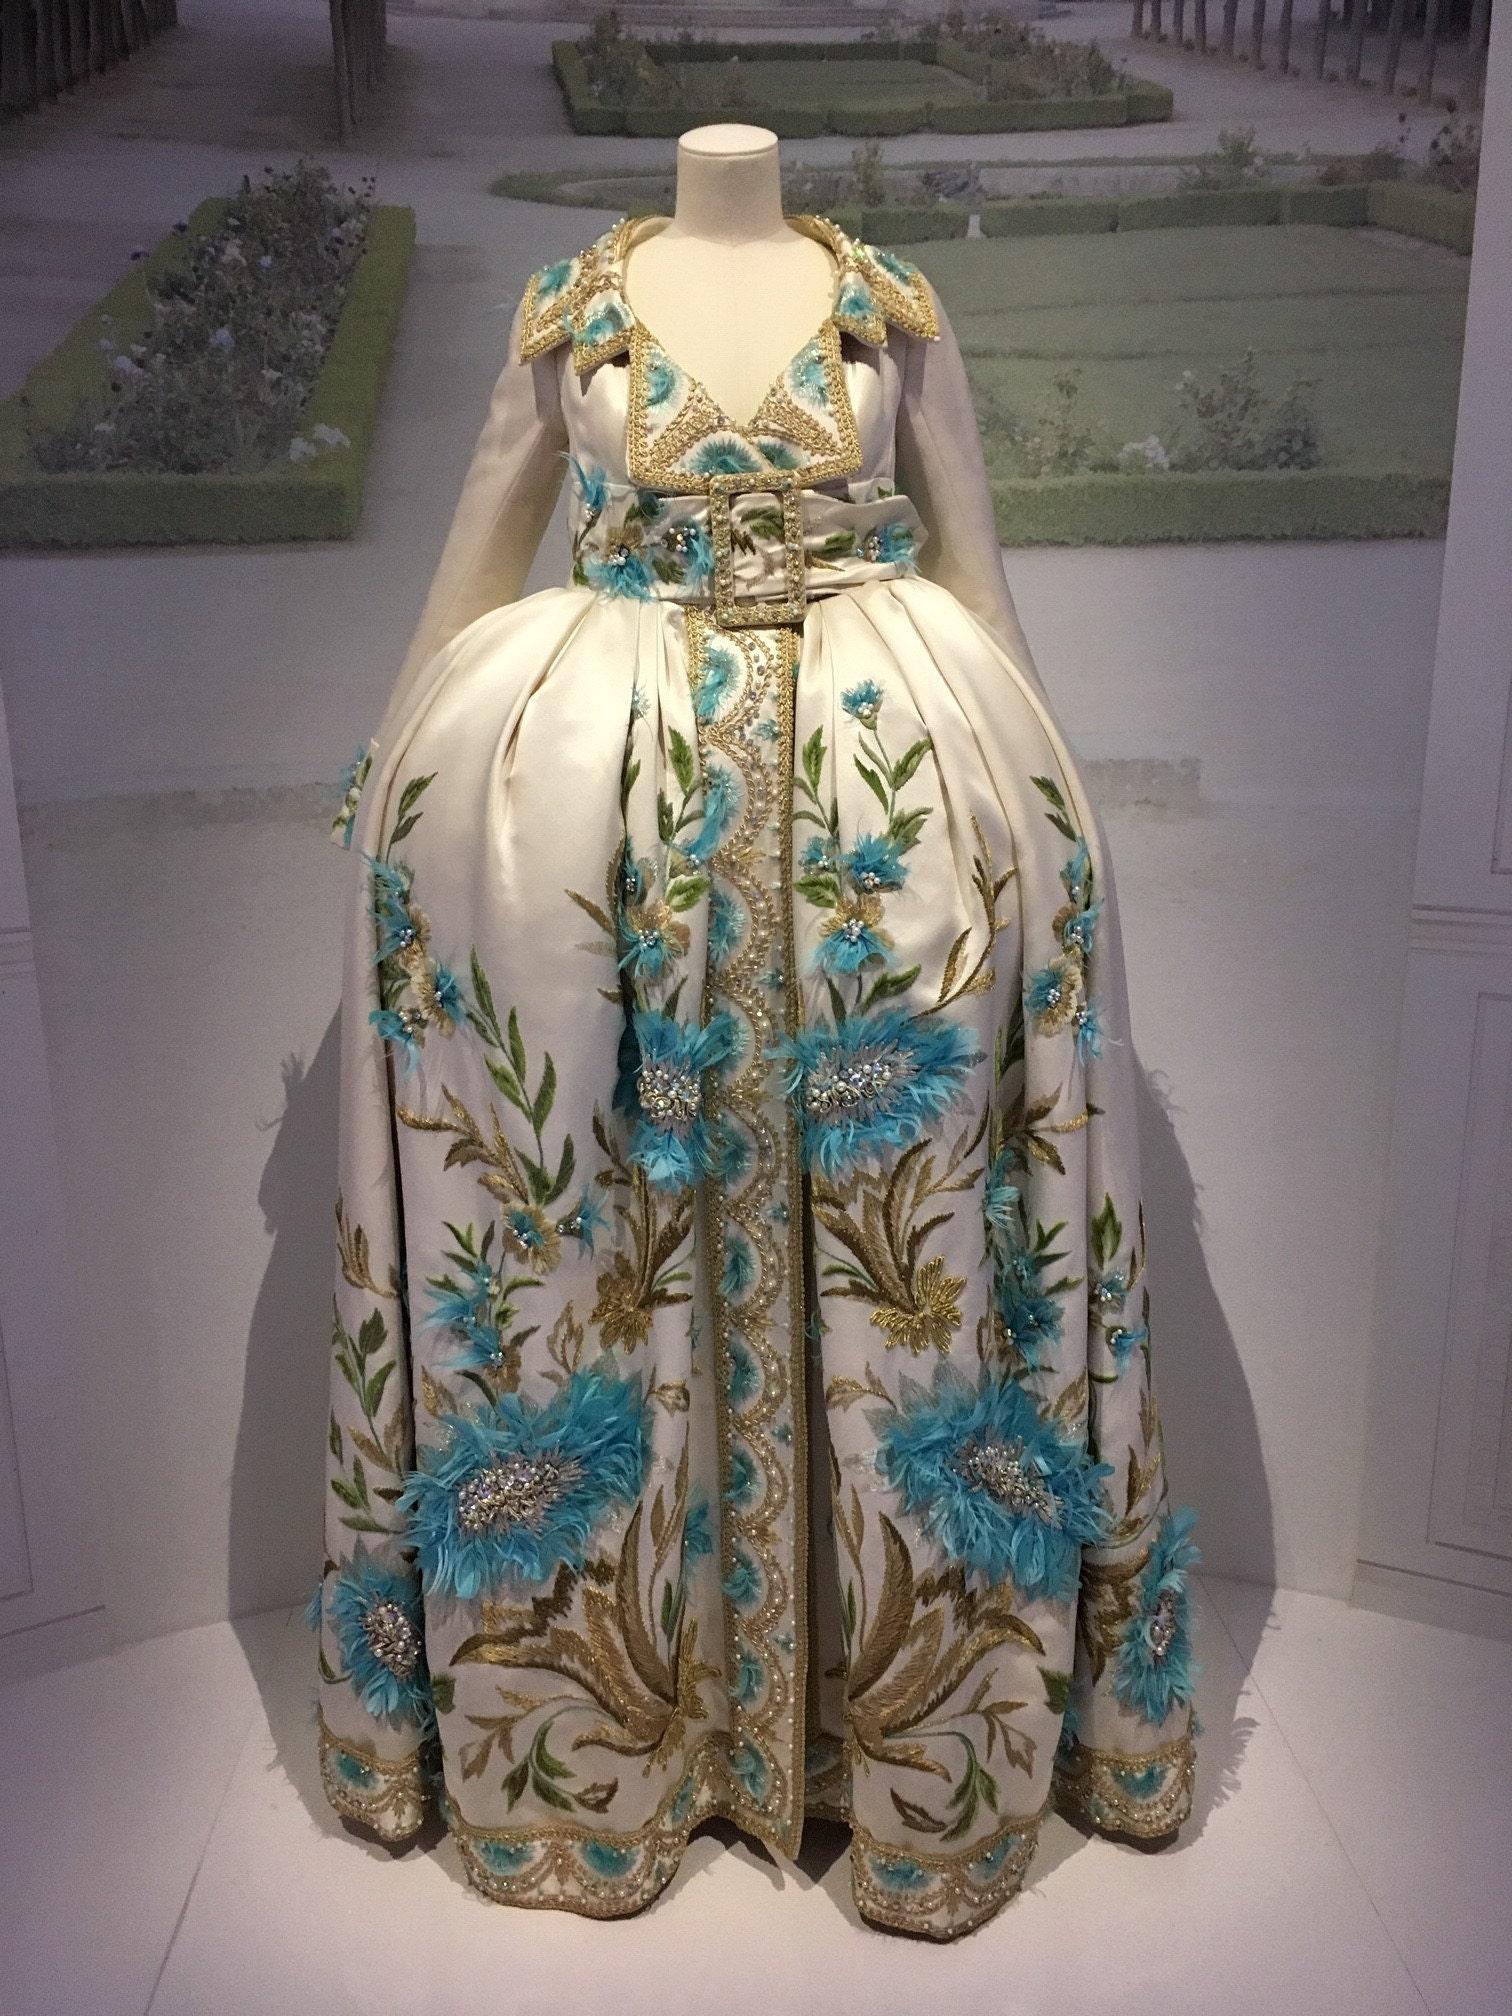 V&A Christian Dior Exhibition: Designer of Dreams